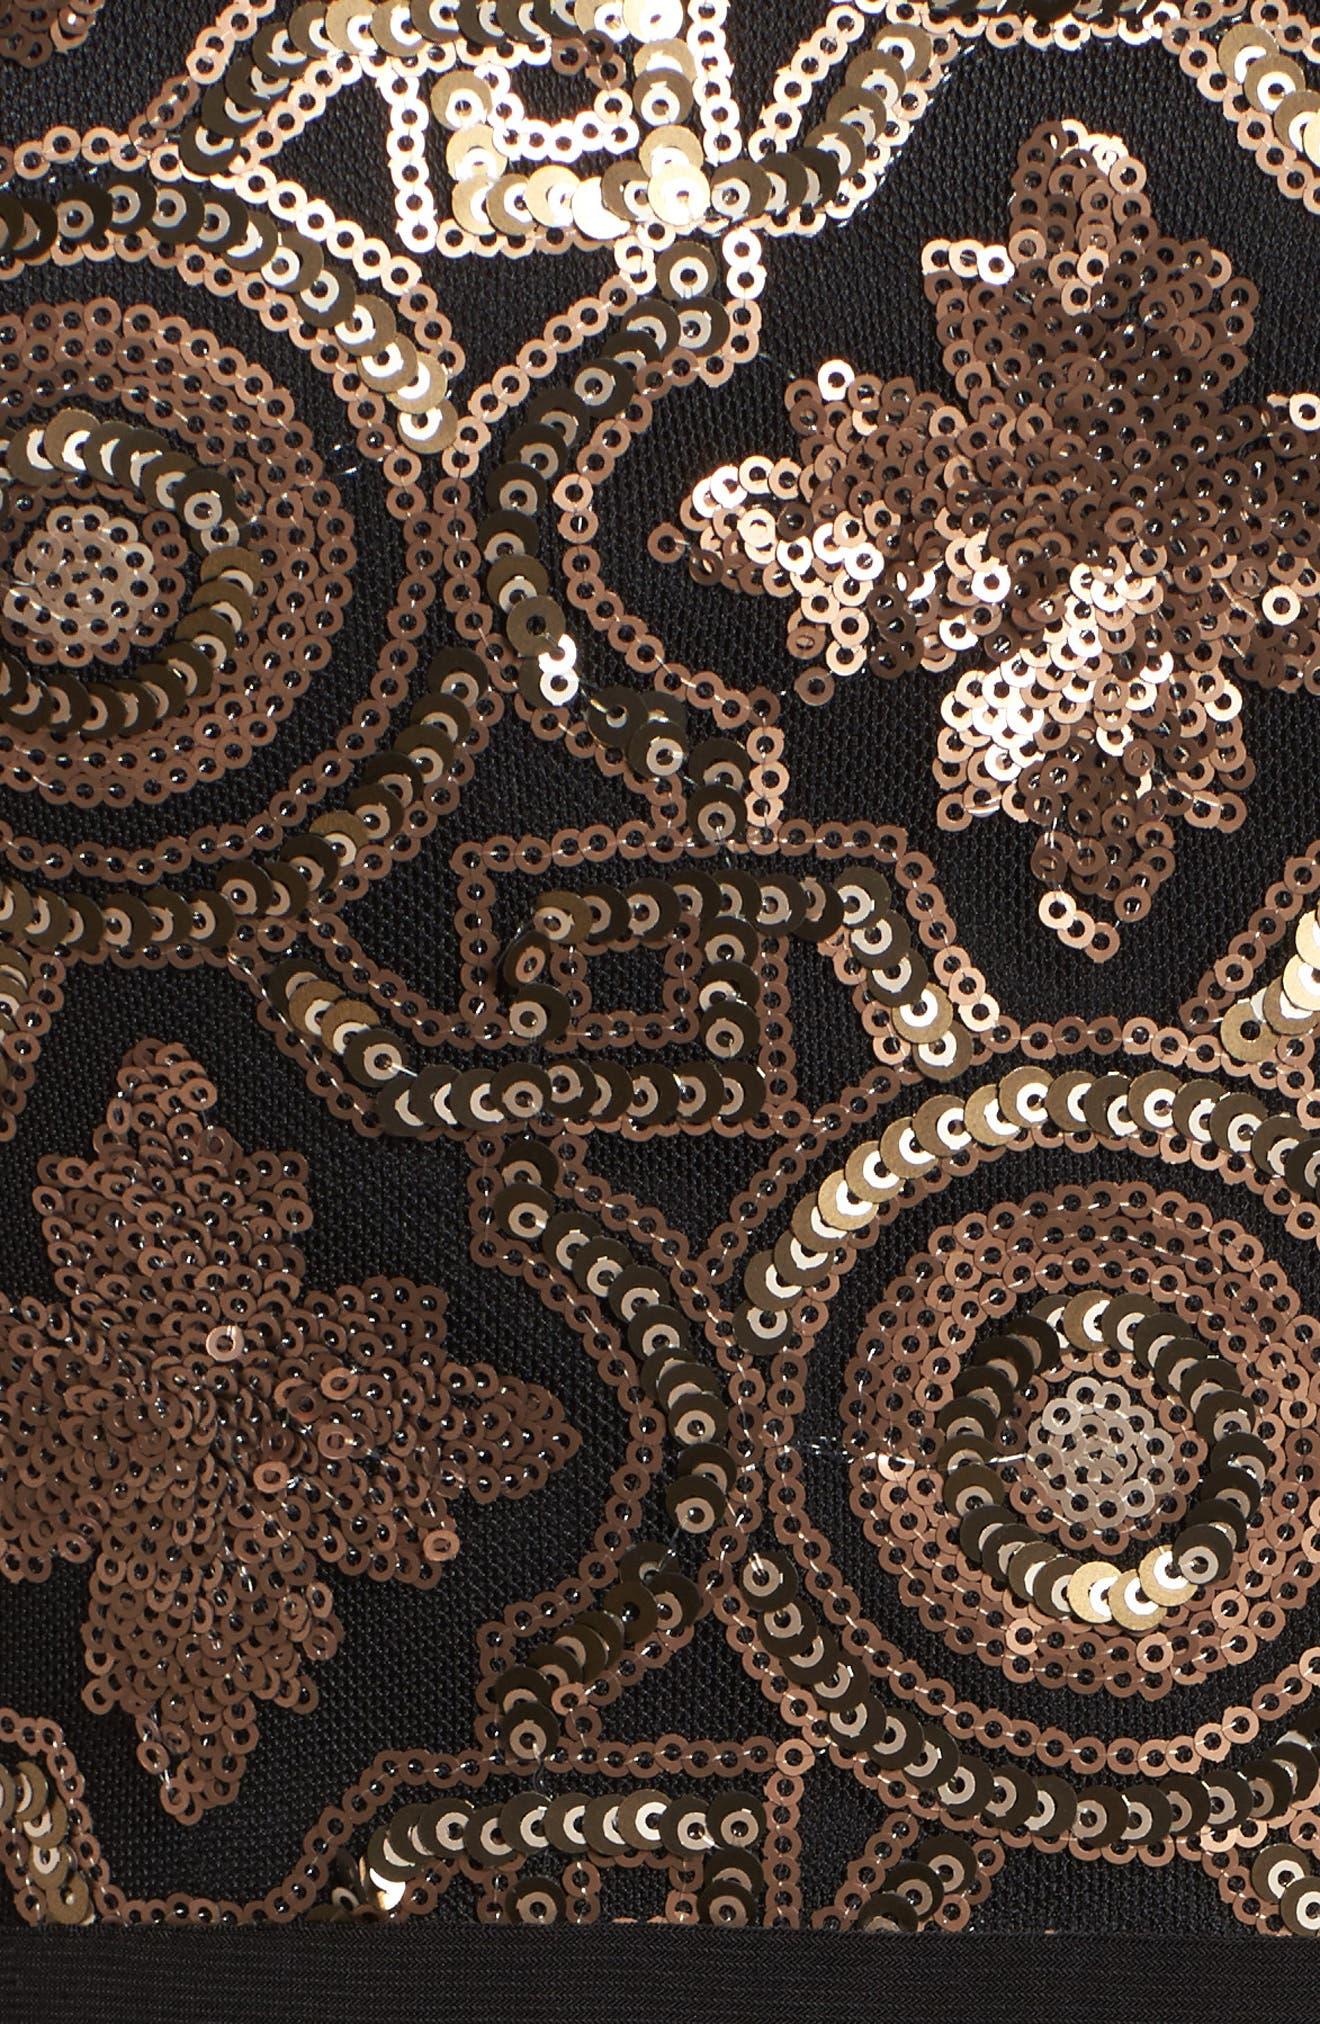 Sequin Cutout Bodice Gown,                             Alternate thumbnail 2, color,                             Black/ Gold